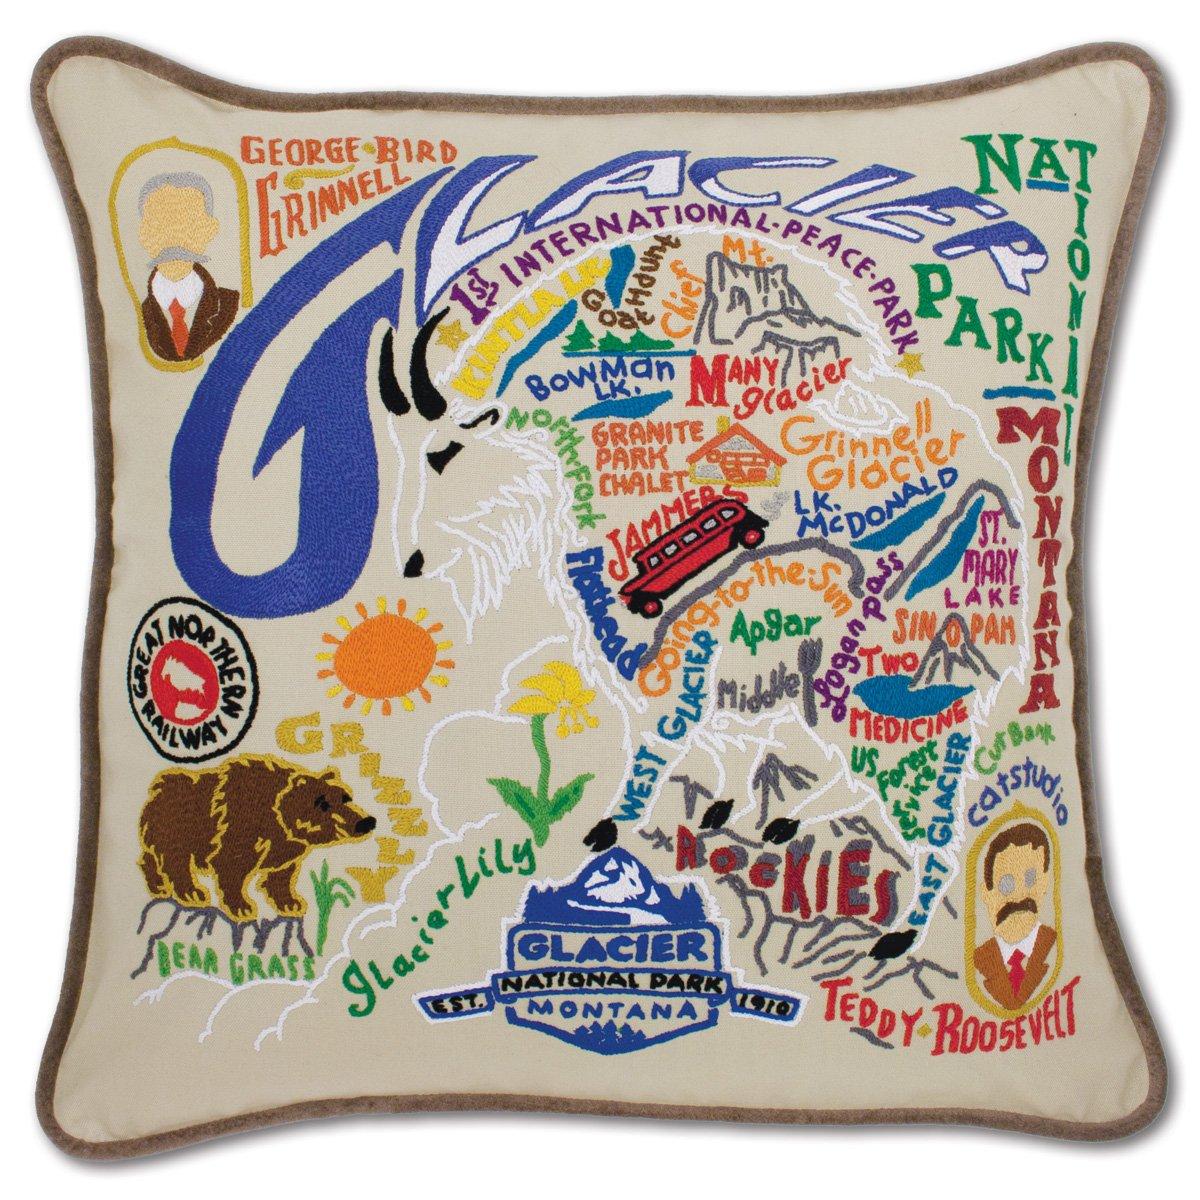 Glacier Park手刺繍枕 ndash; Catstudio  B00ESF6YAI